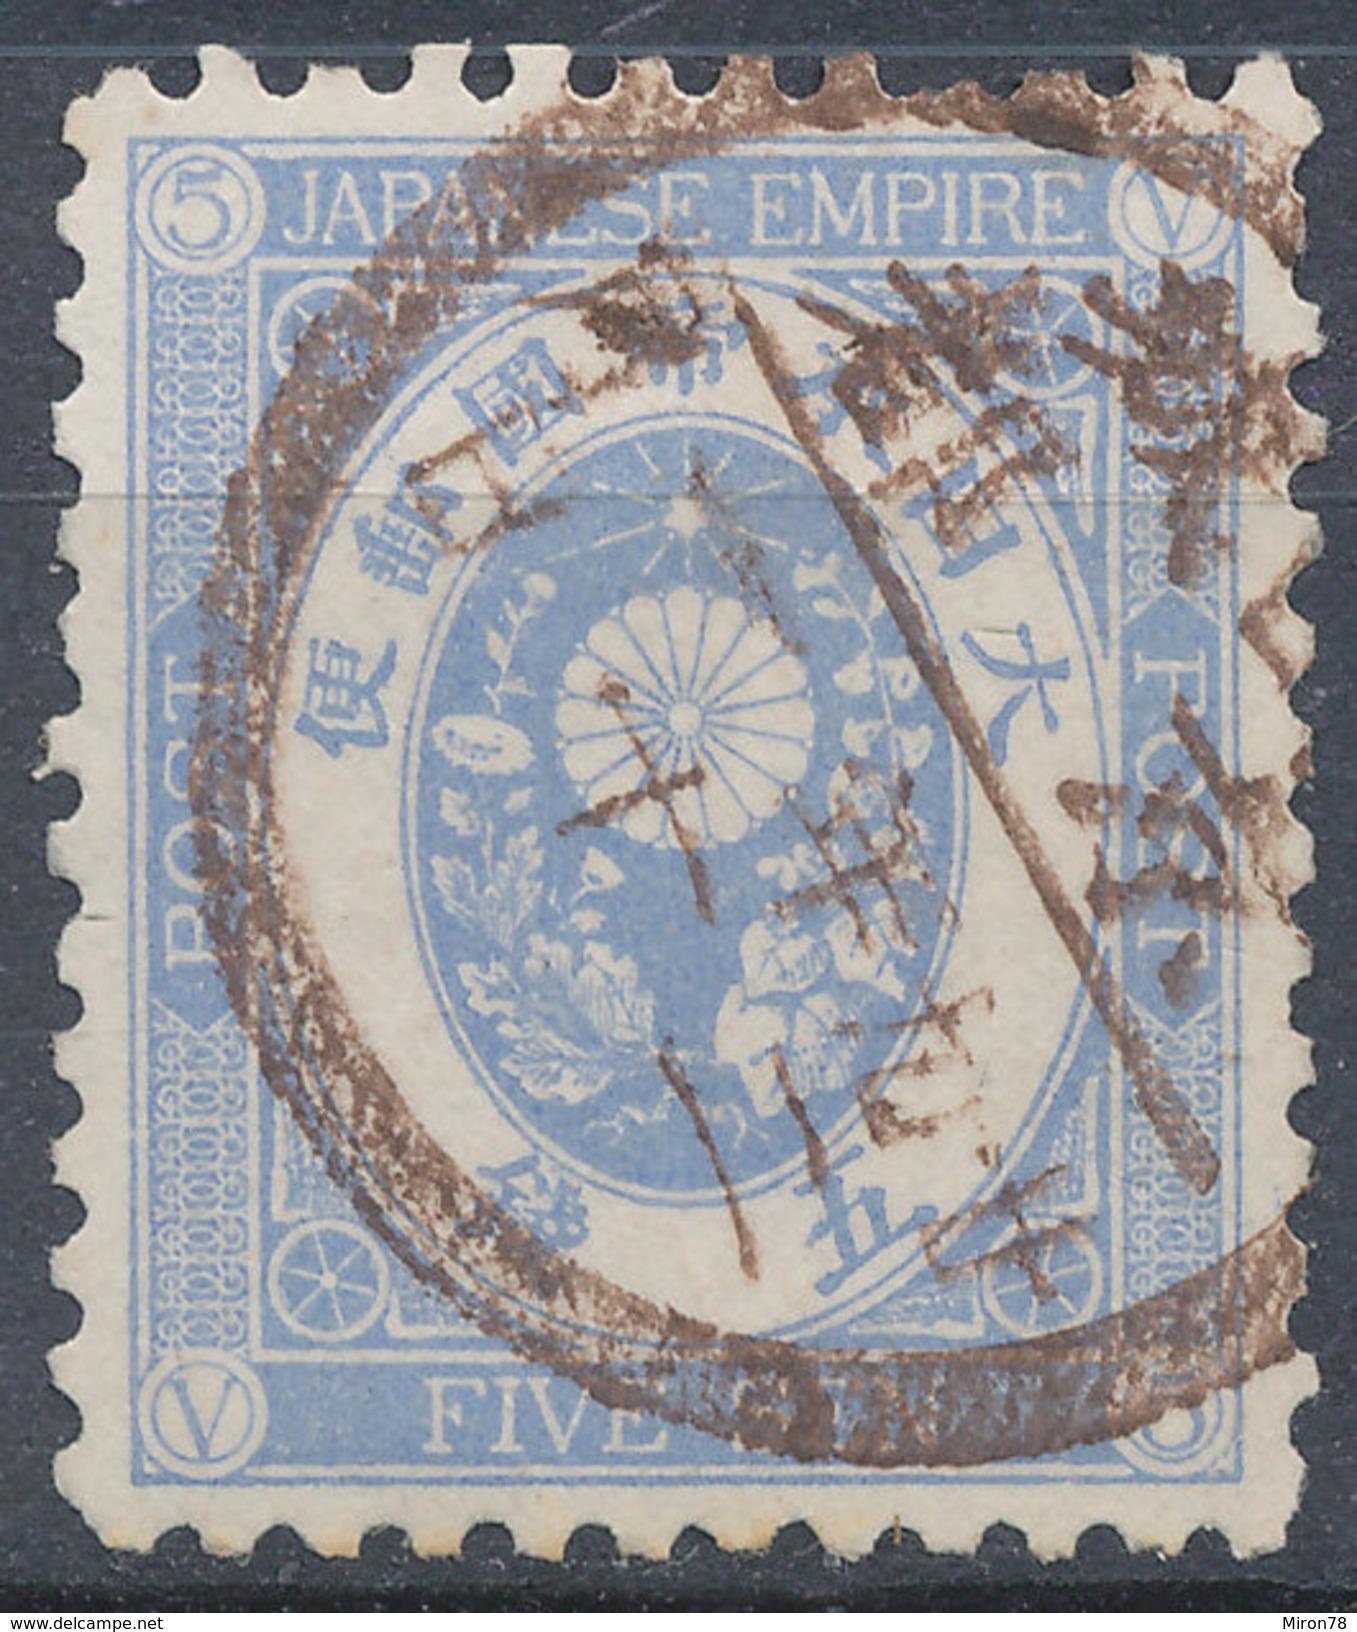 Stamp Japan  5s Used Fancy Cancel Lot#54 - Japan